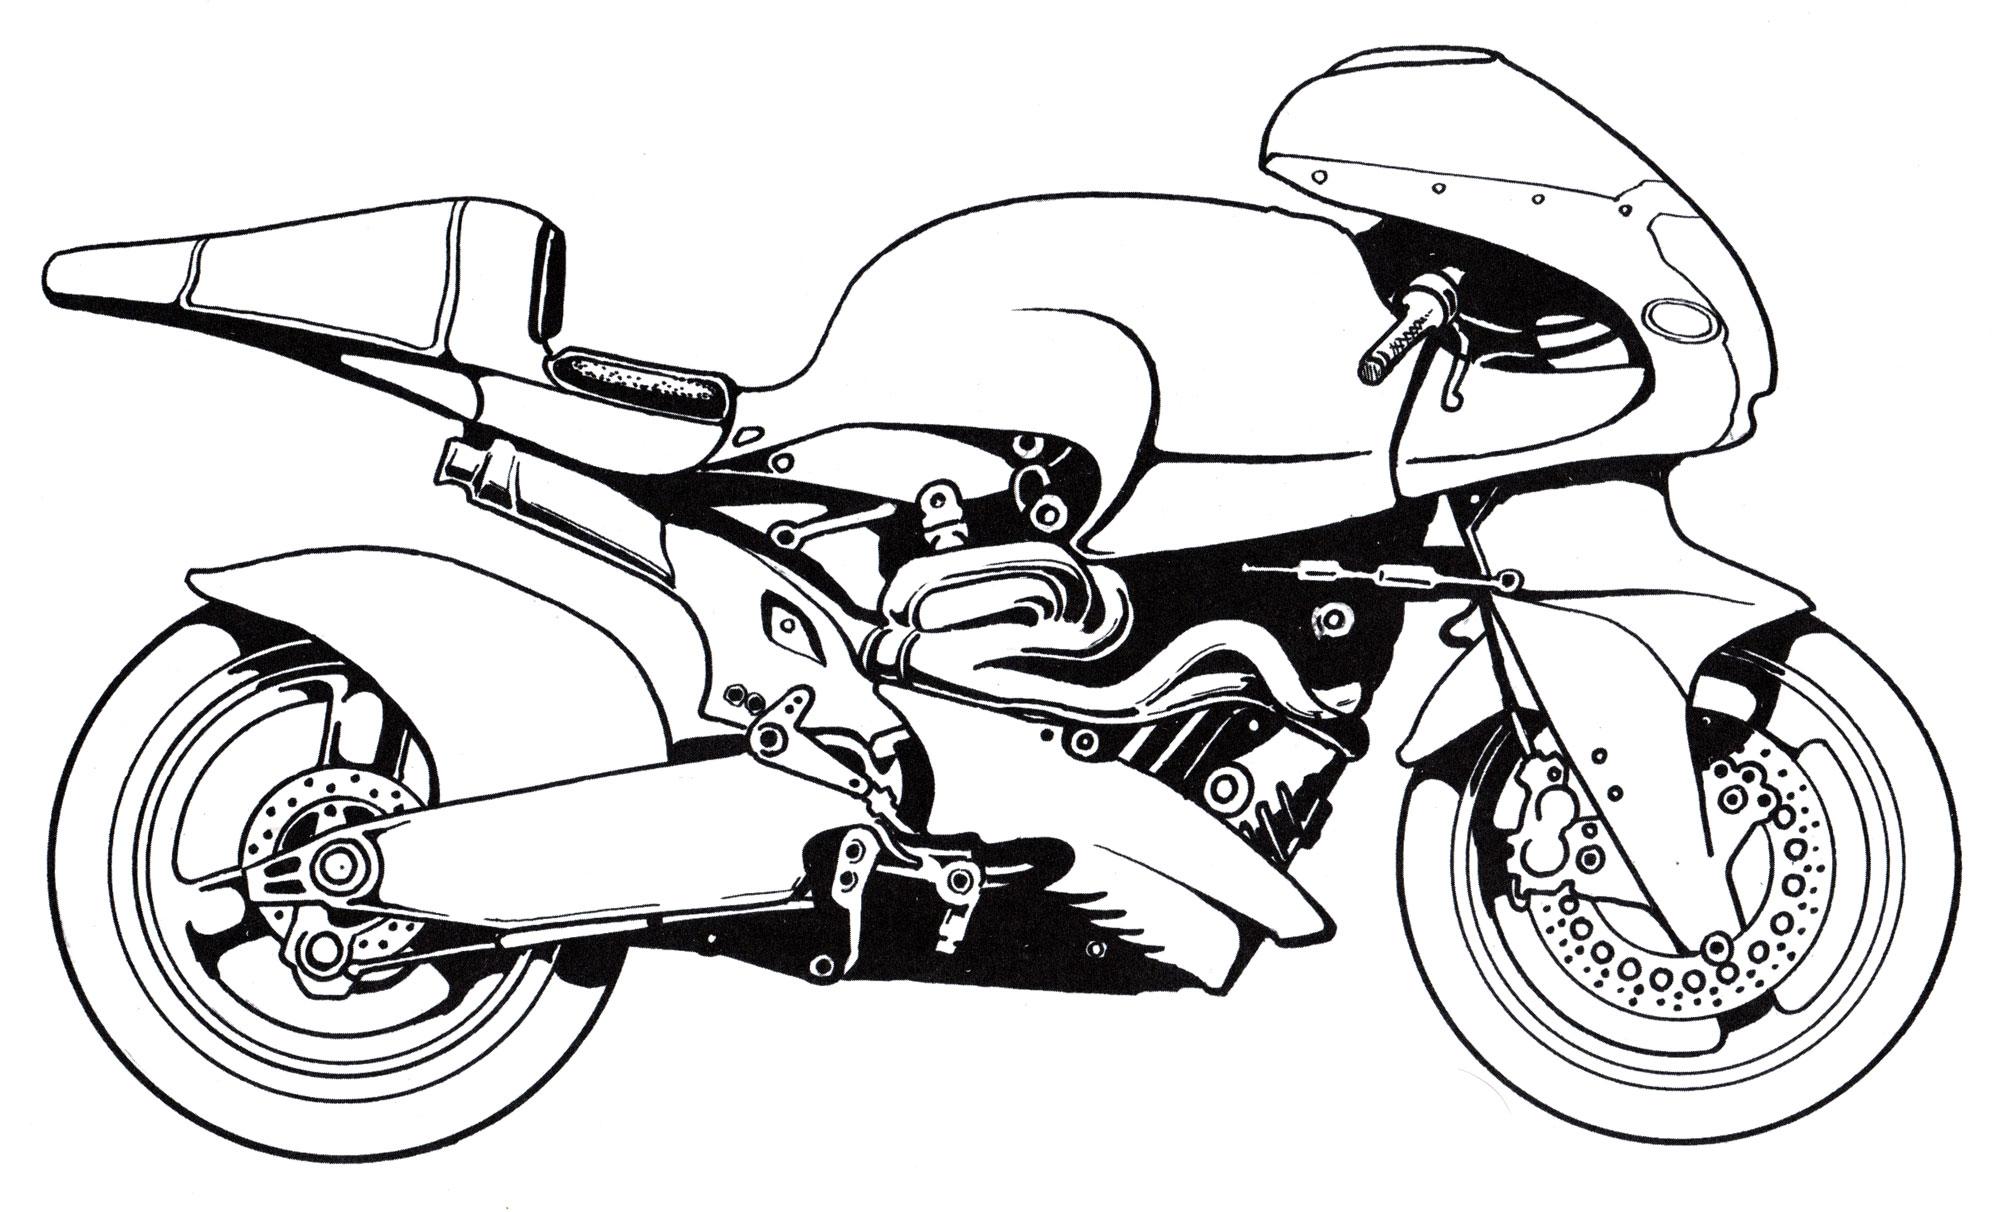 Раскраска Мотоцикл Britten | Раскраски мотоциклы